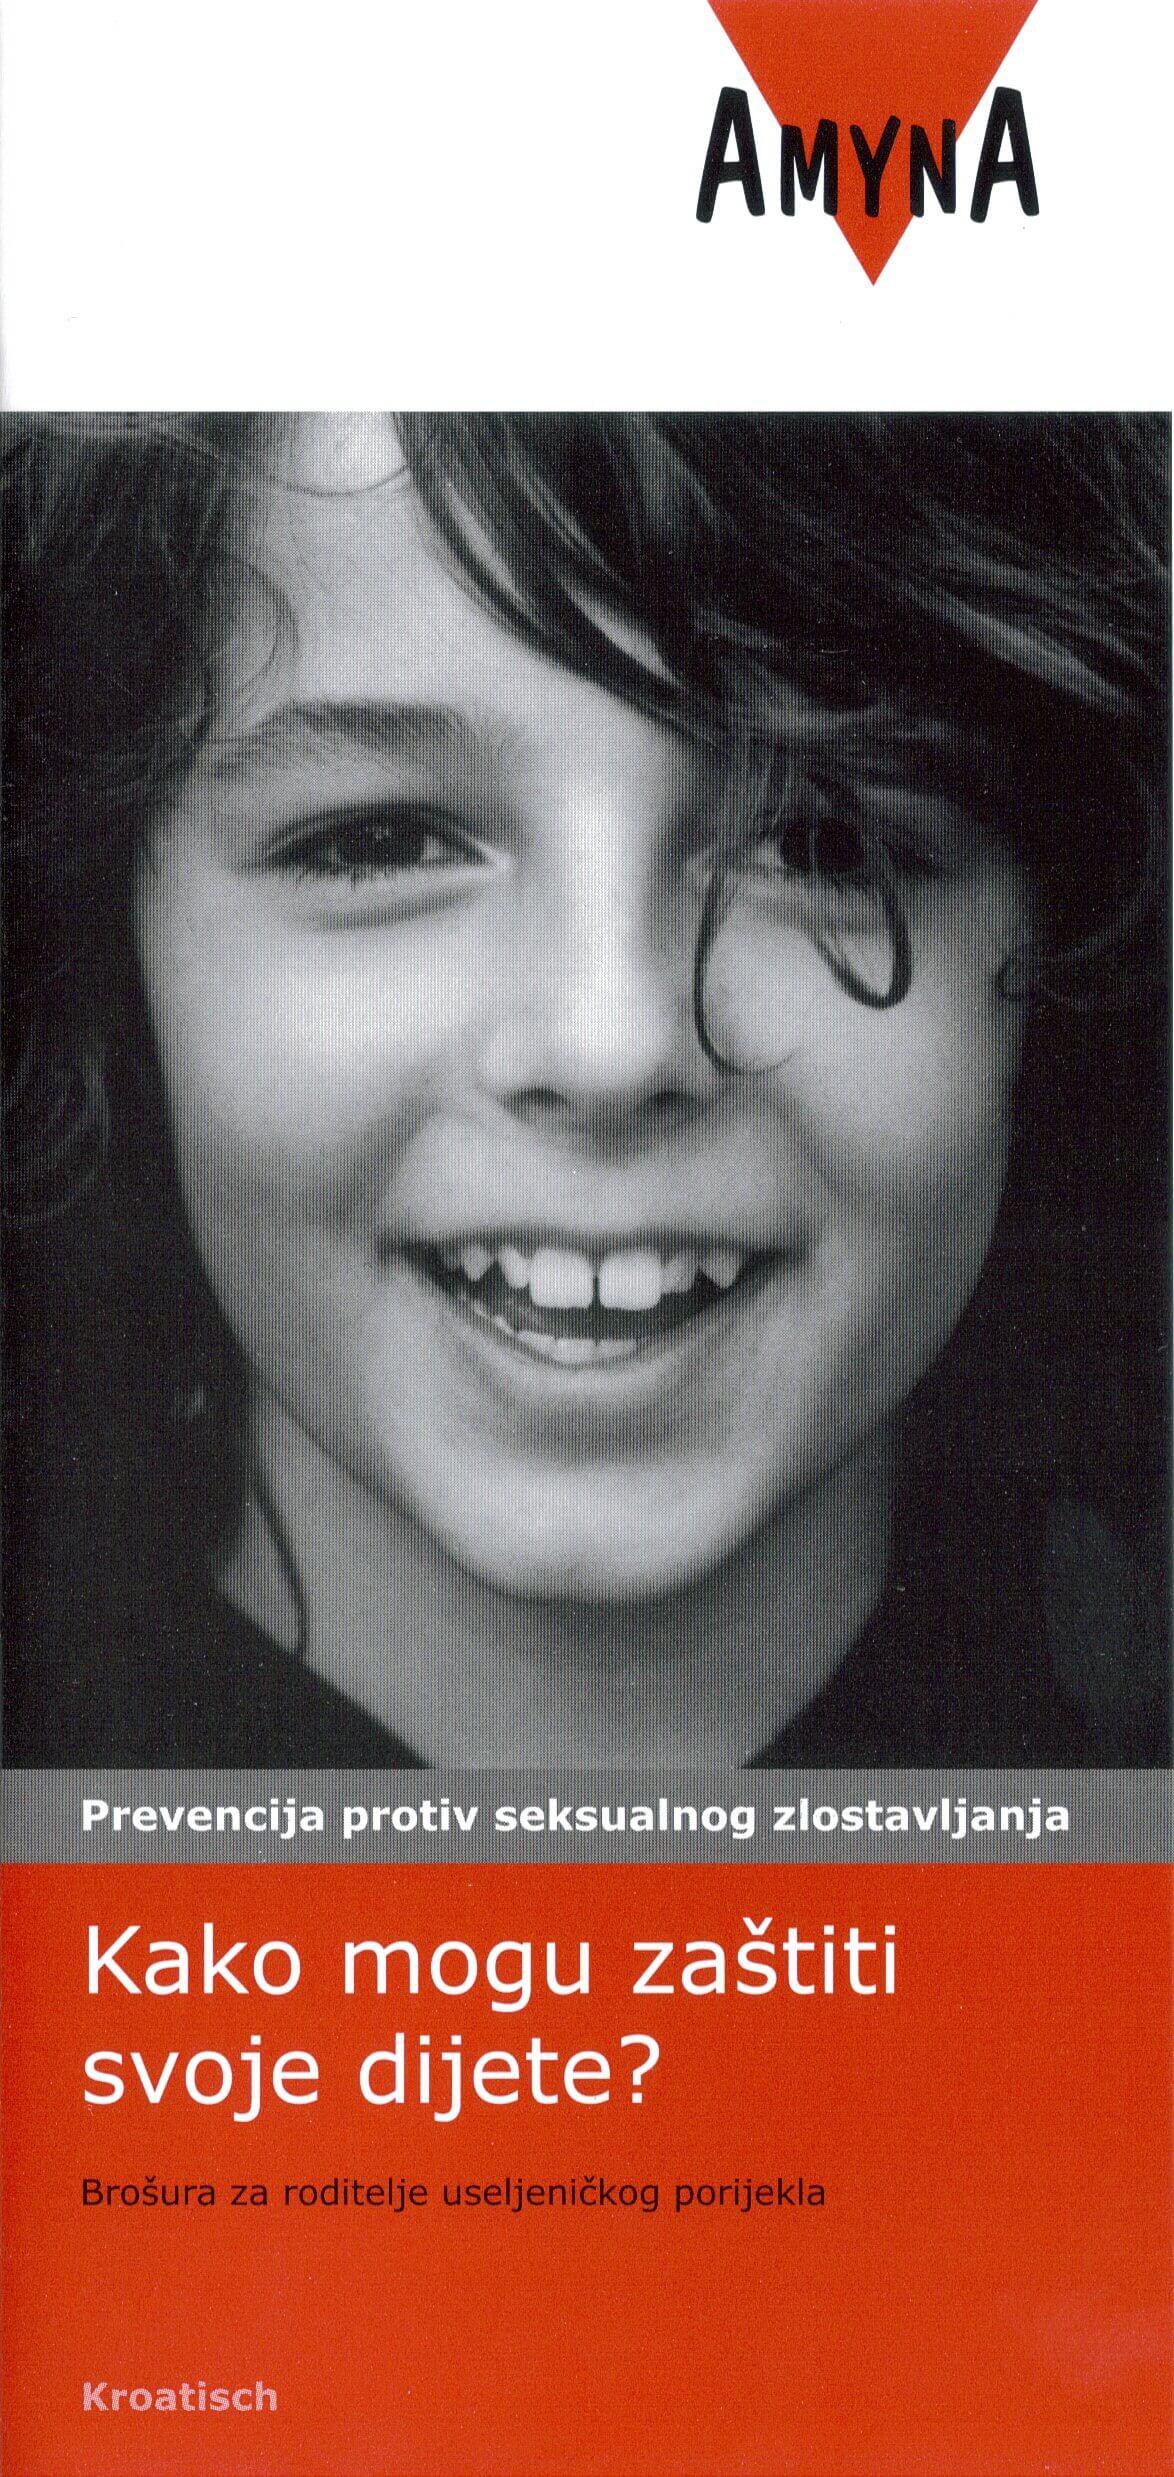 elternbroschuere_kroatisch_gr